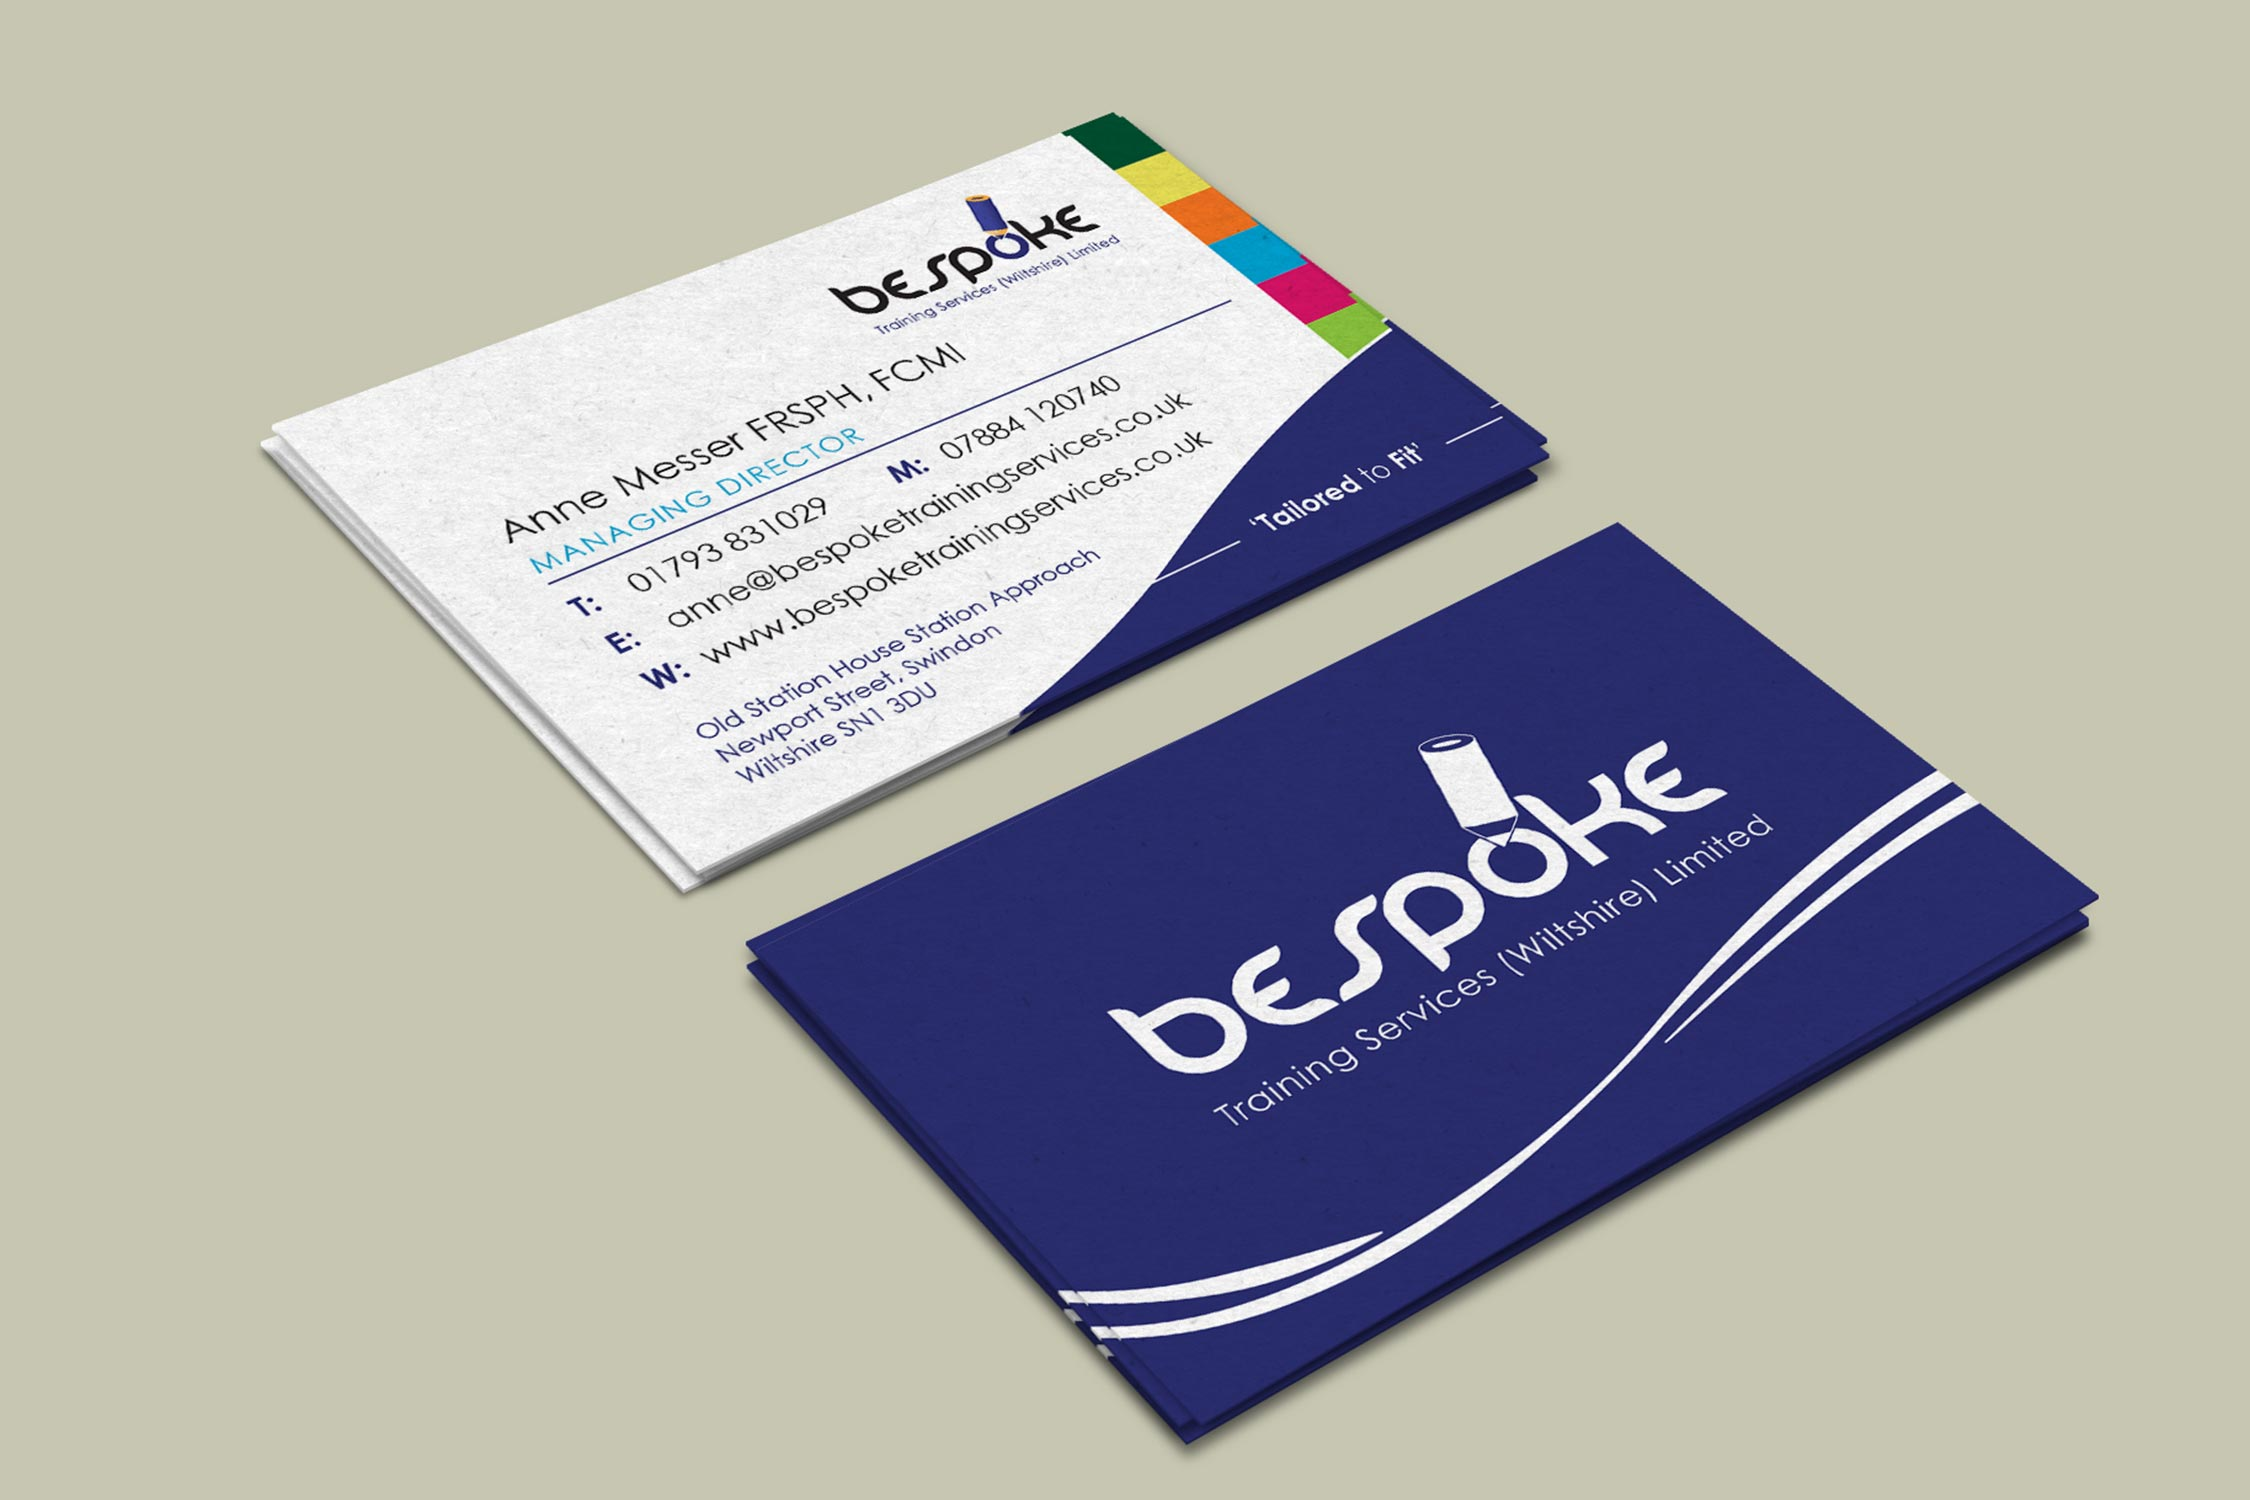 C3-business-cards-bespoke-training - C3 MARKETING LTD